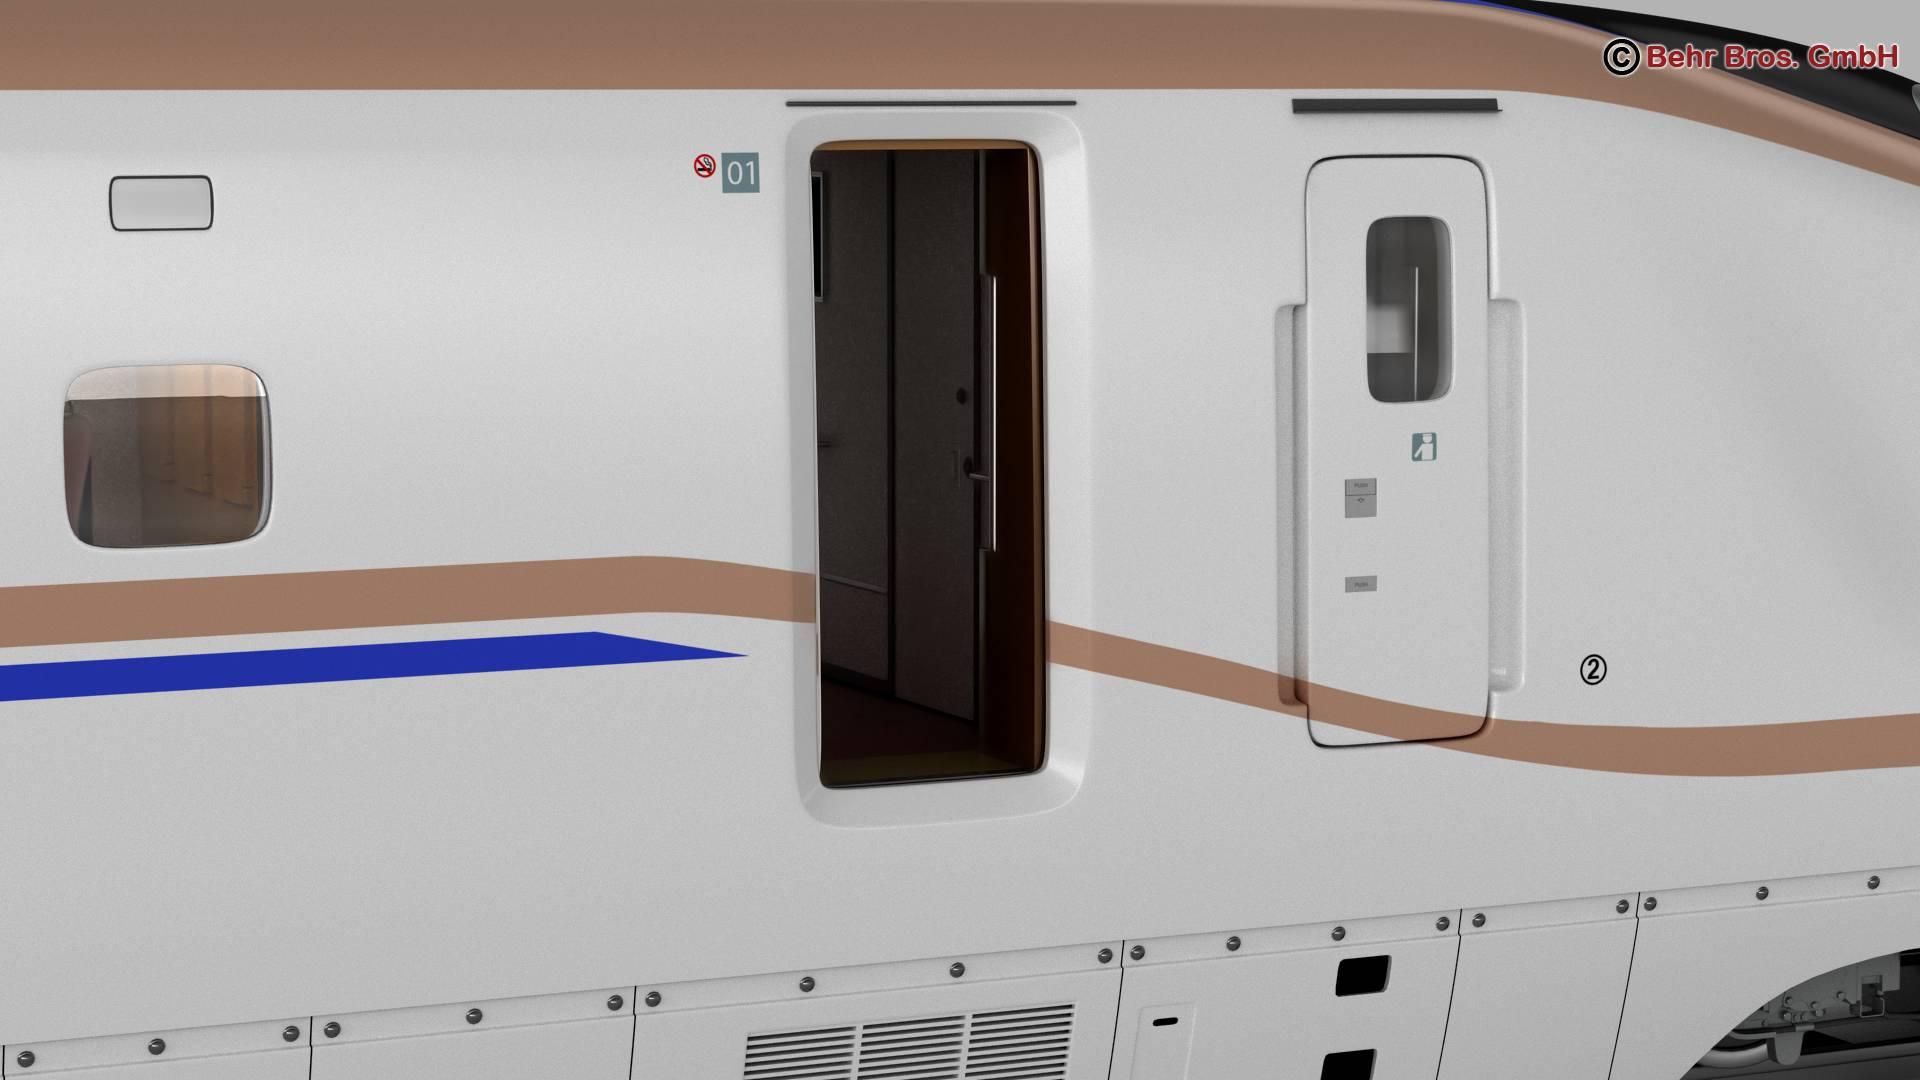 shinkansen e7 3d model 3ds max fbx c4d lwo ma mb obj 265657